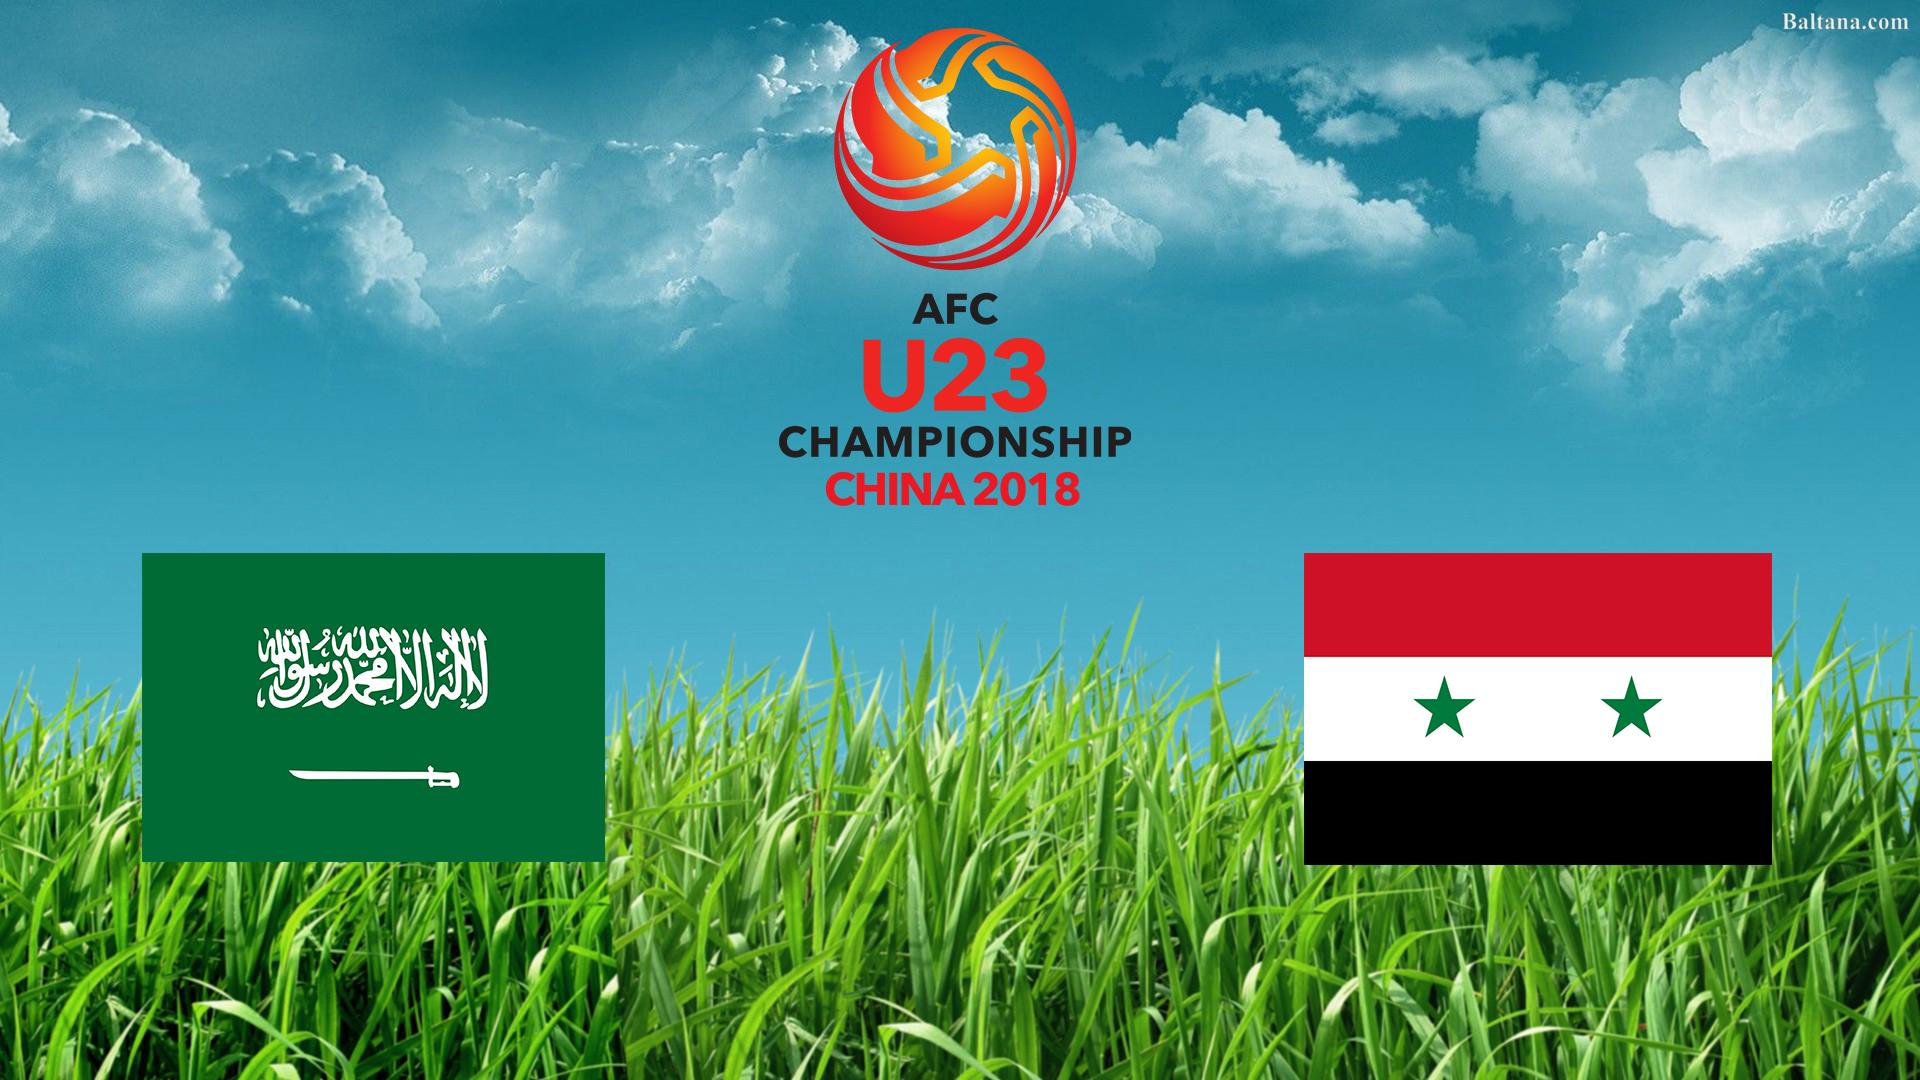 soi-keo-ca-cuoc-bong-da-ngay-15-1-u23-a-rap-saudi-vs-u23-syria-chiem-lay-ngoi-dau-b9 1